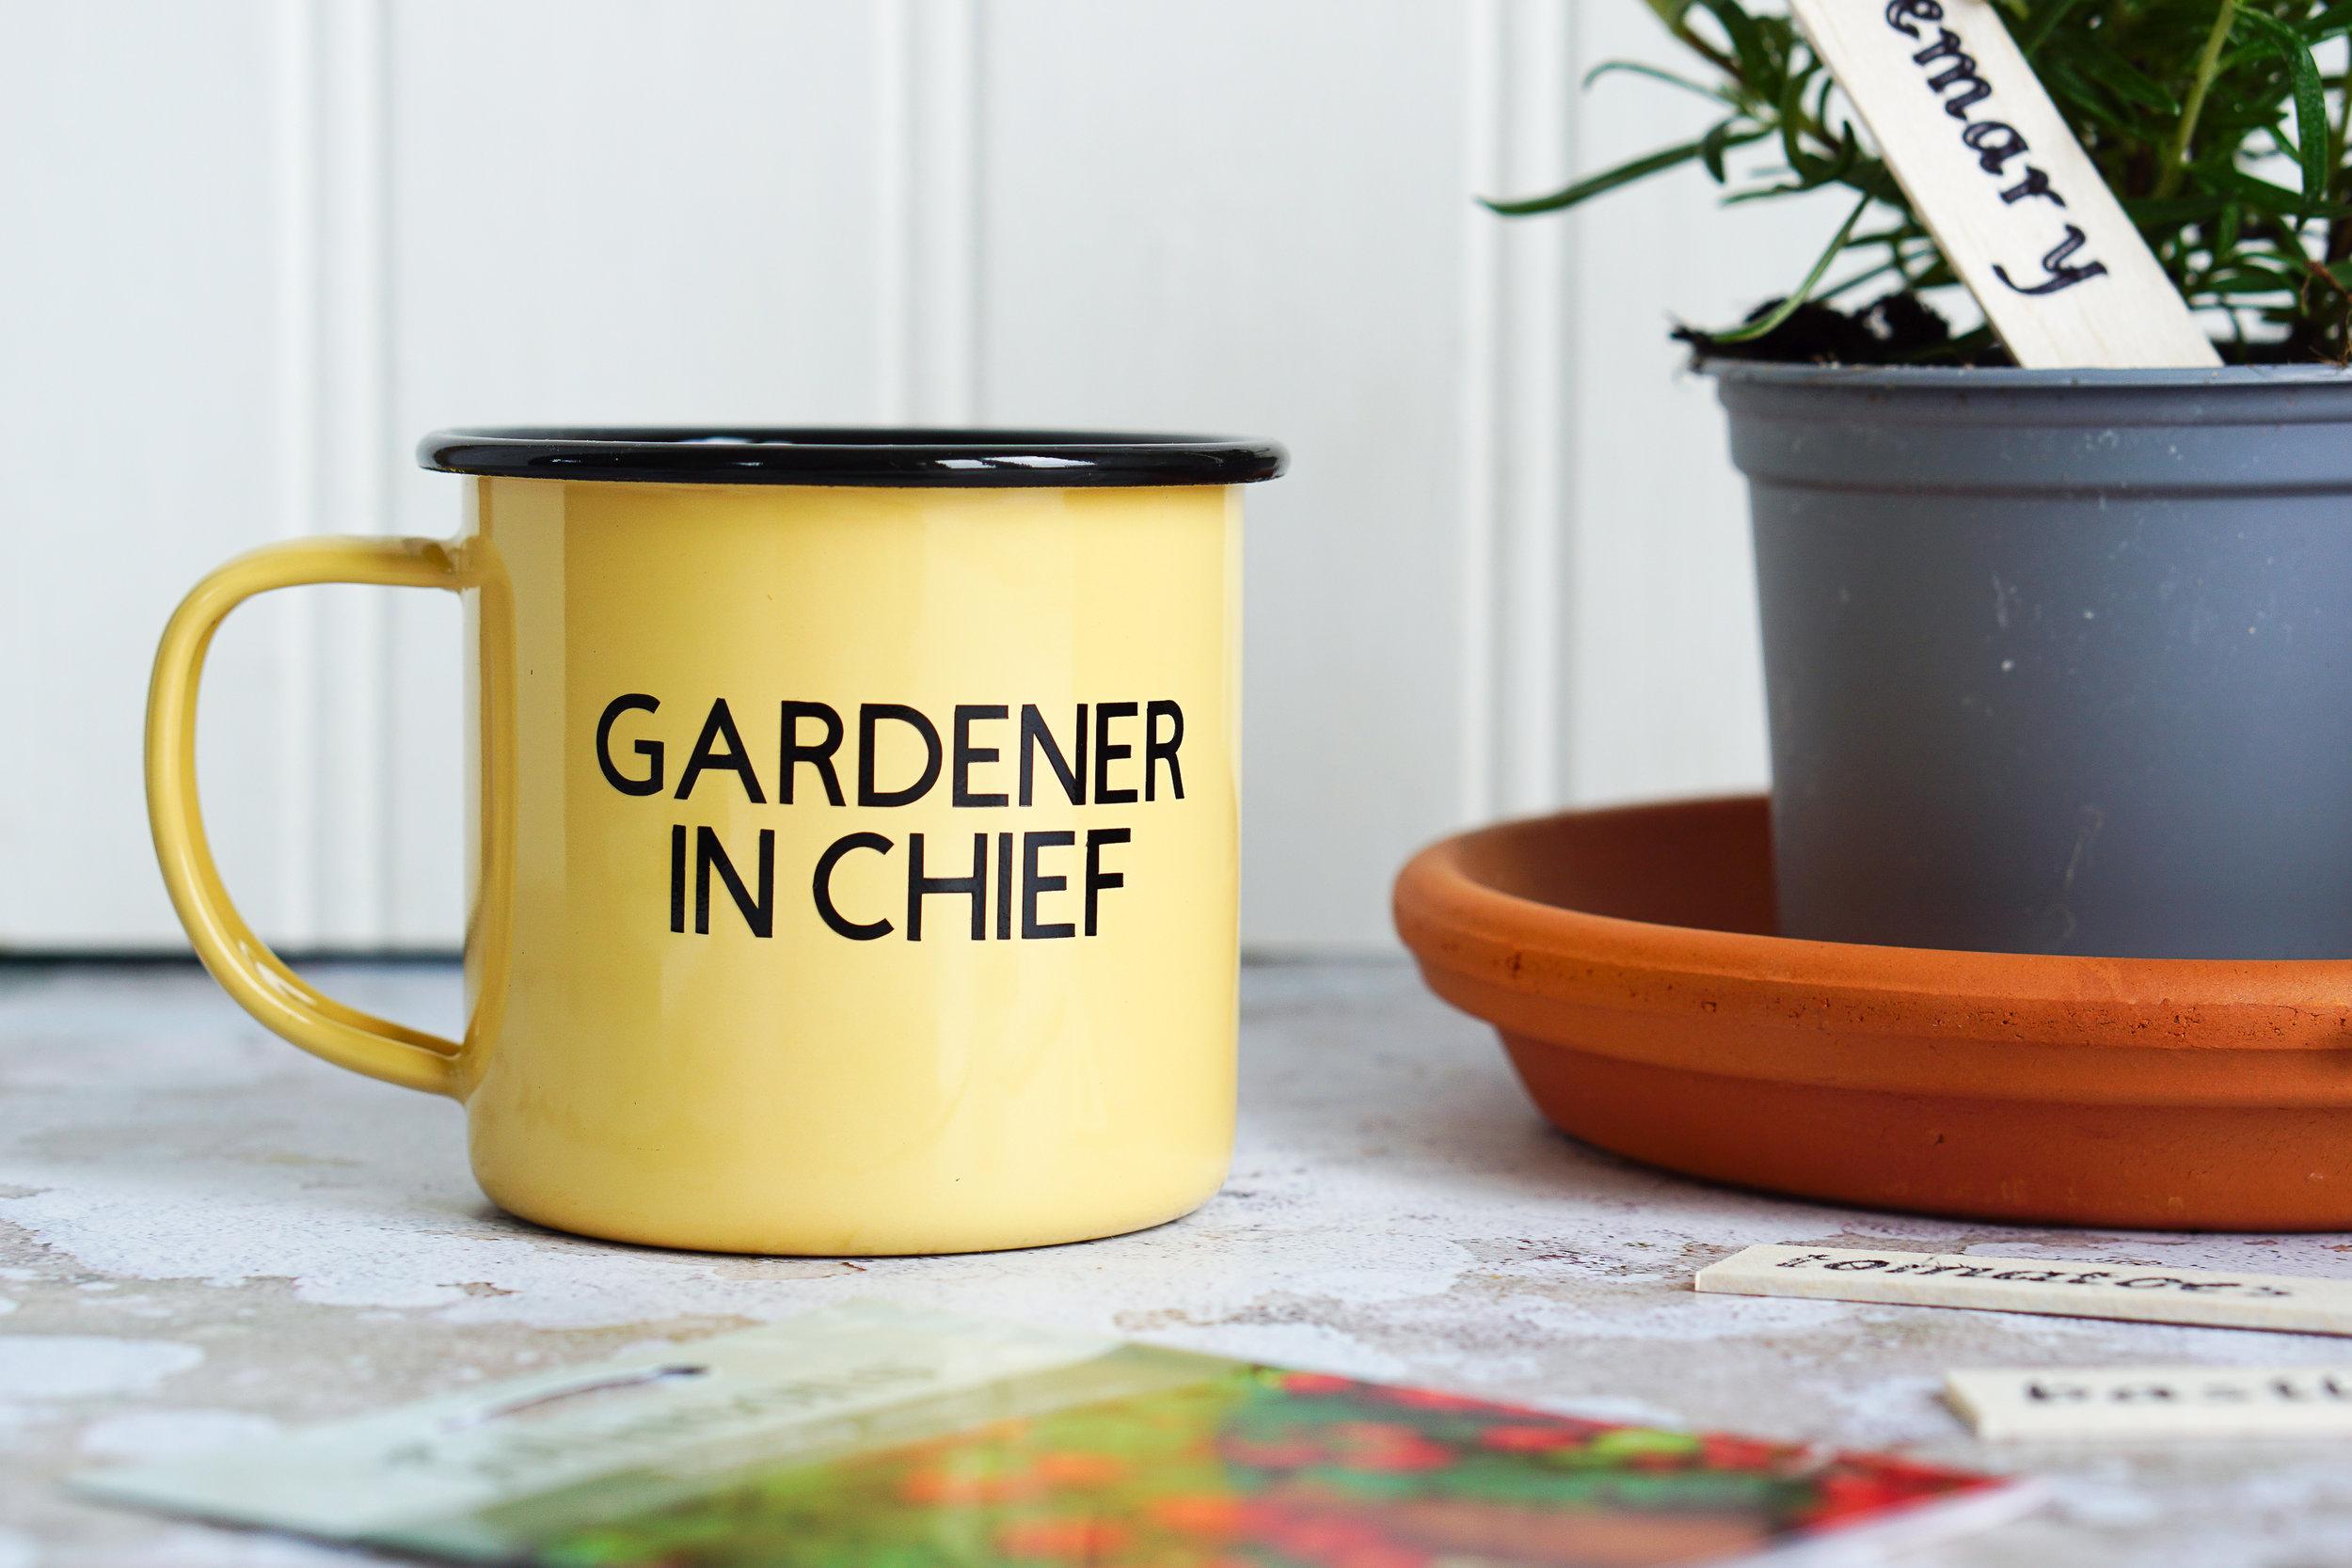 Cricut Maker gardening projects